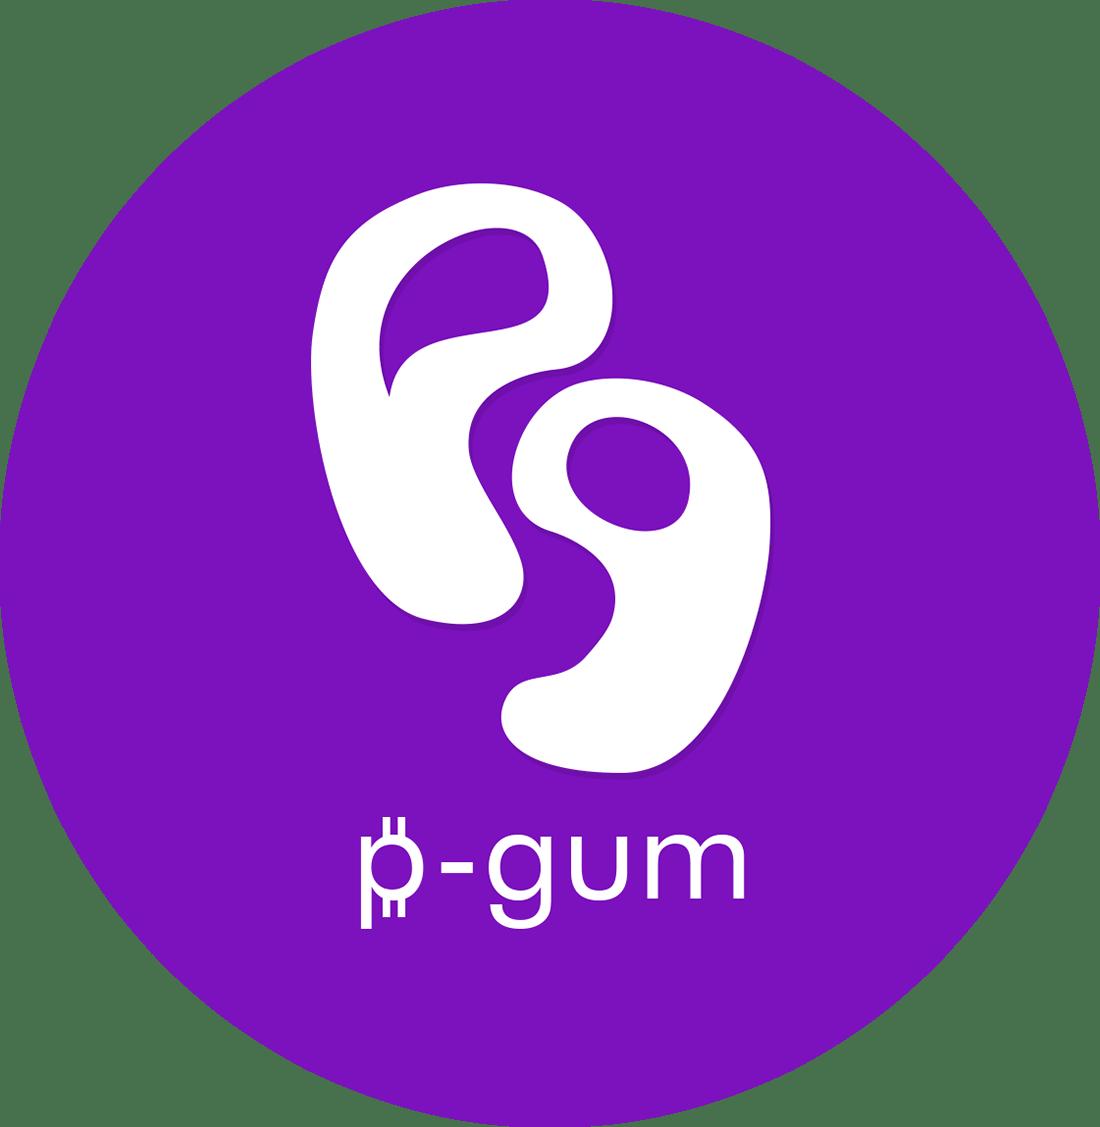 پیگام